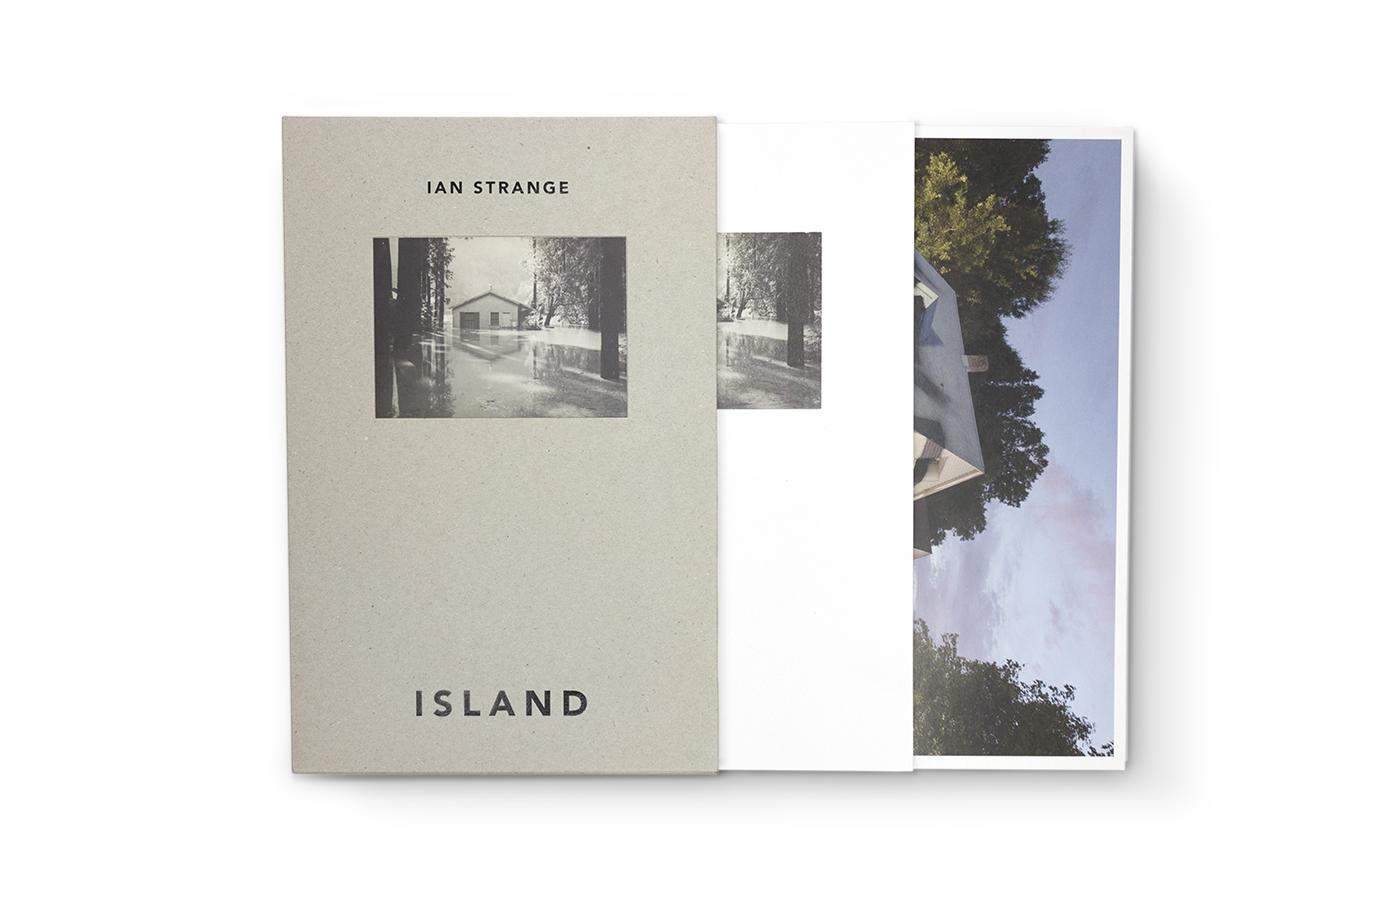 Ian Strange,  ISLAND , 2017, Limited edition Art publication 1st Edition/400, Published by PAMPAM, Australian edition published by Peachy Print